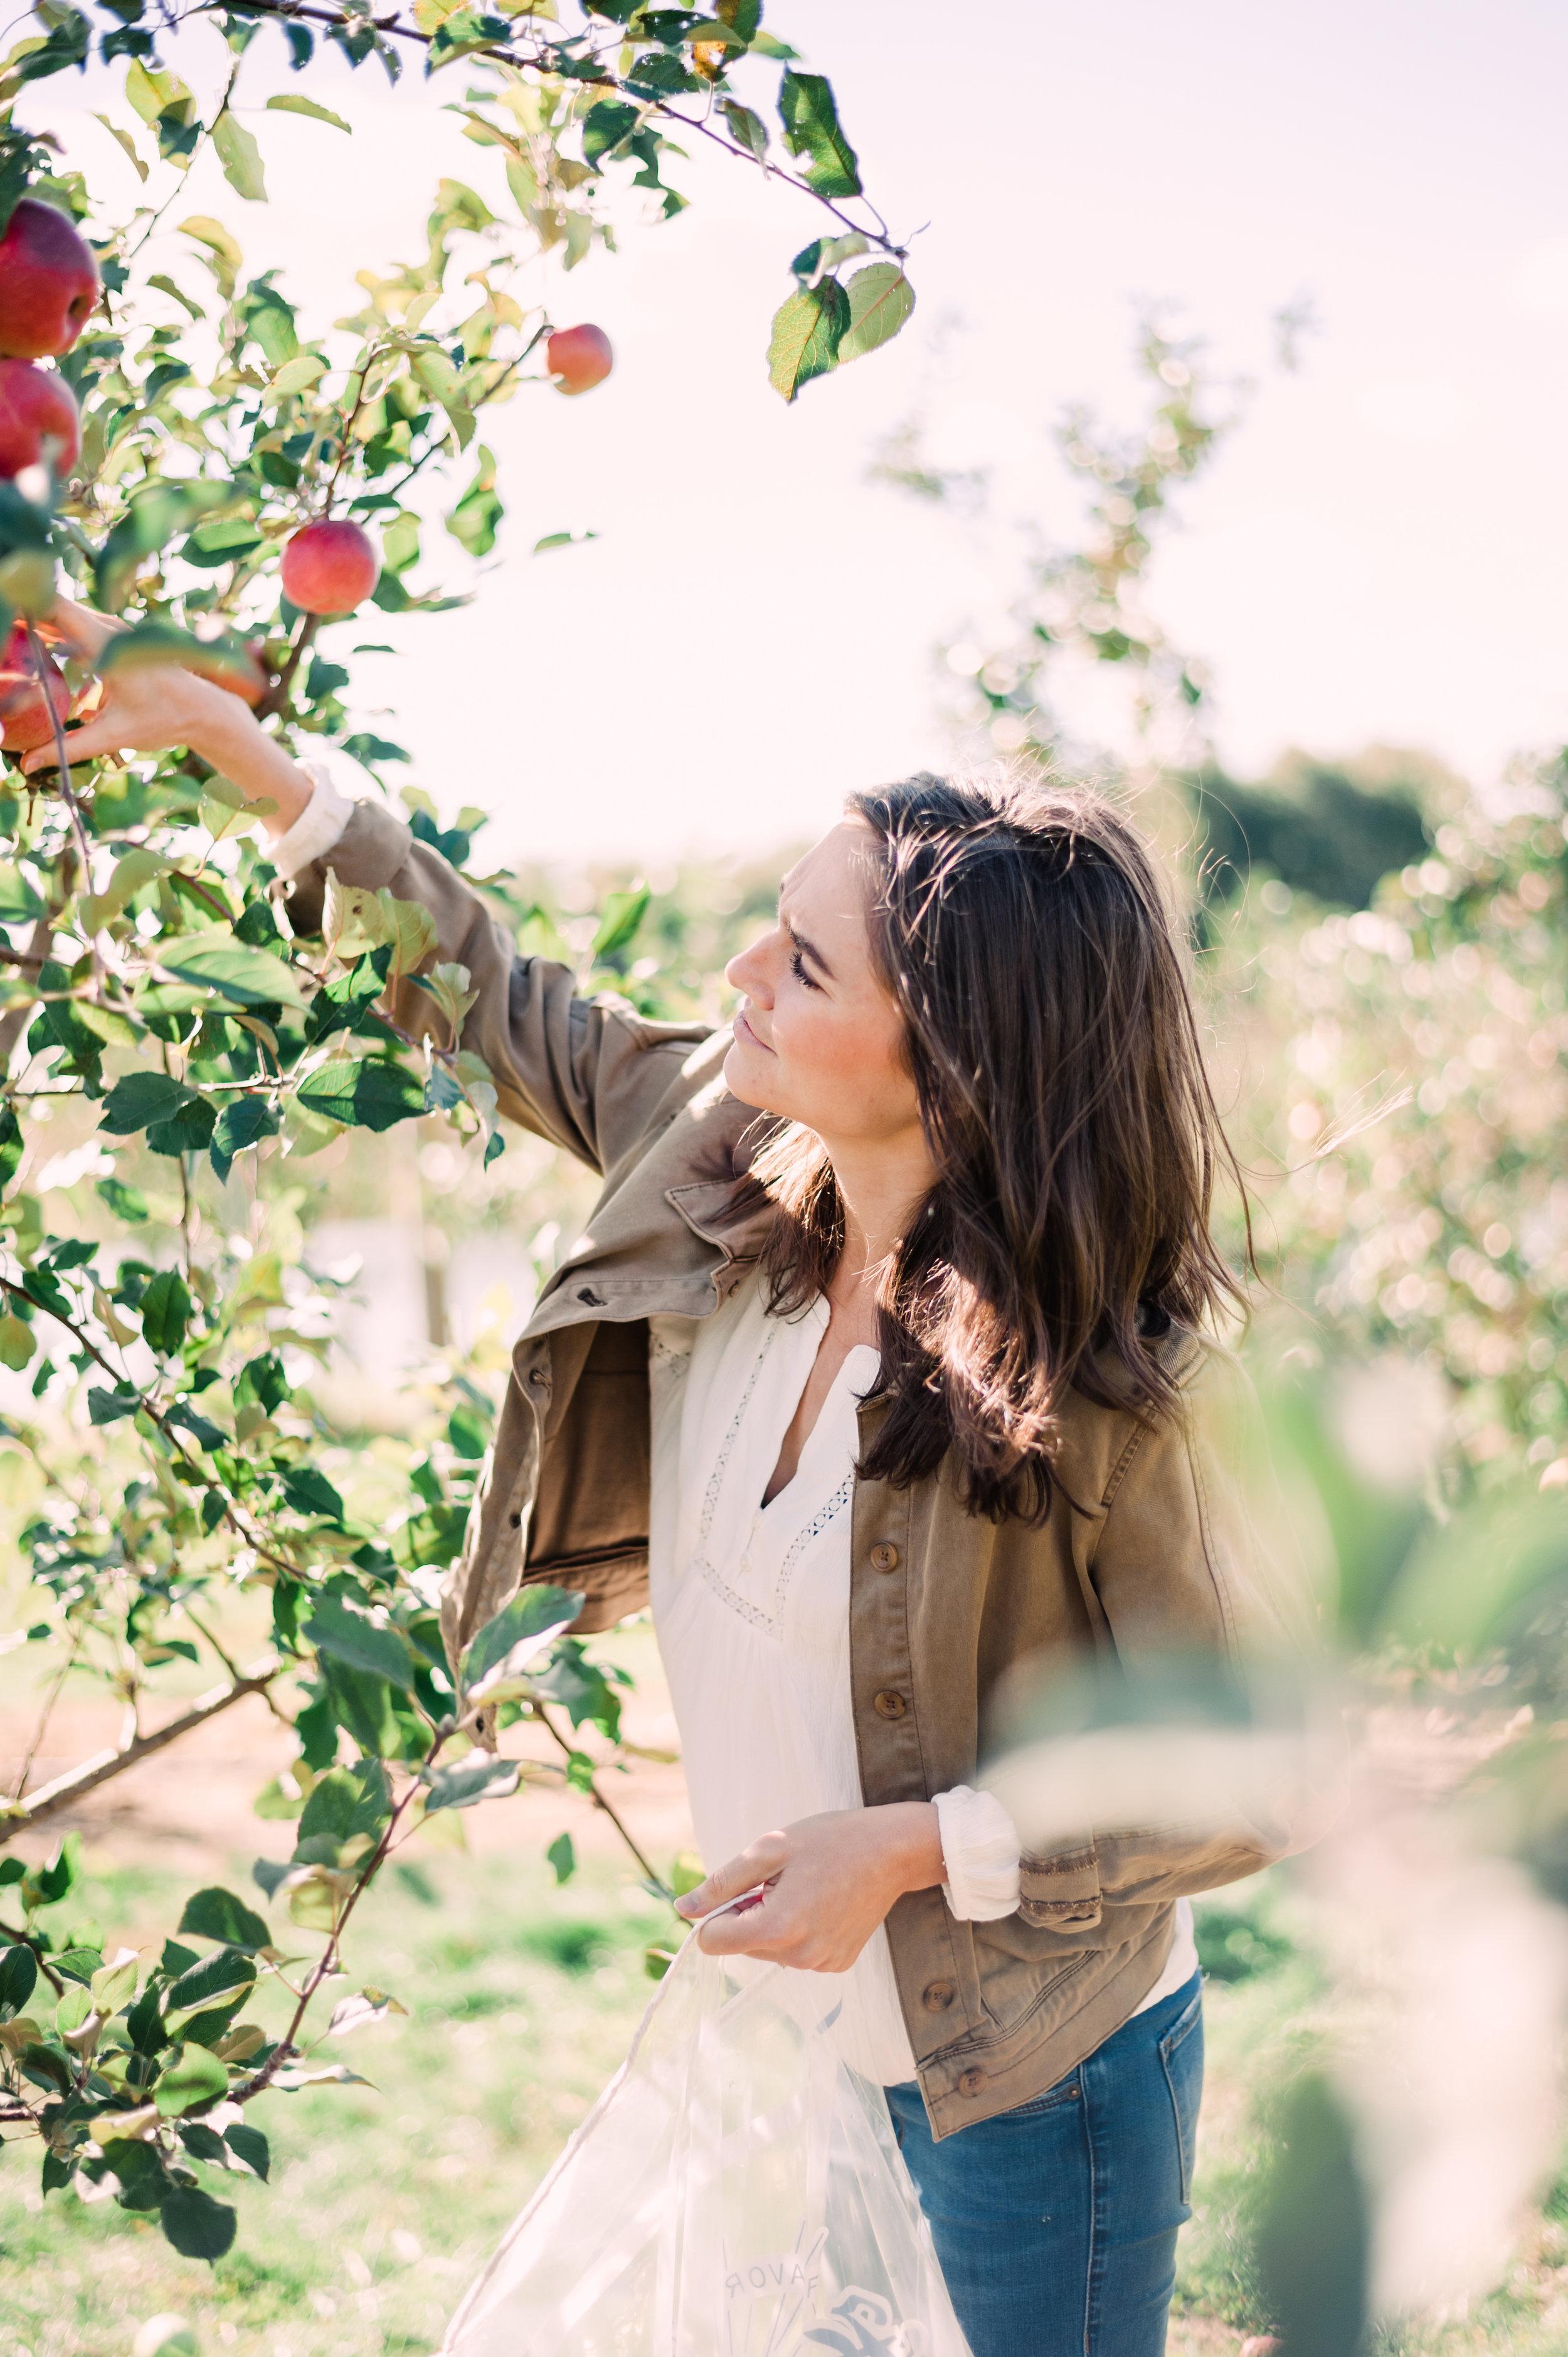 Fall October Huber's Orchard -3.JPG